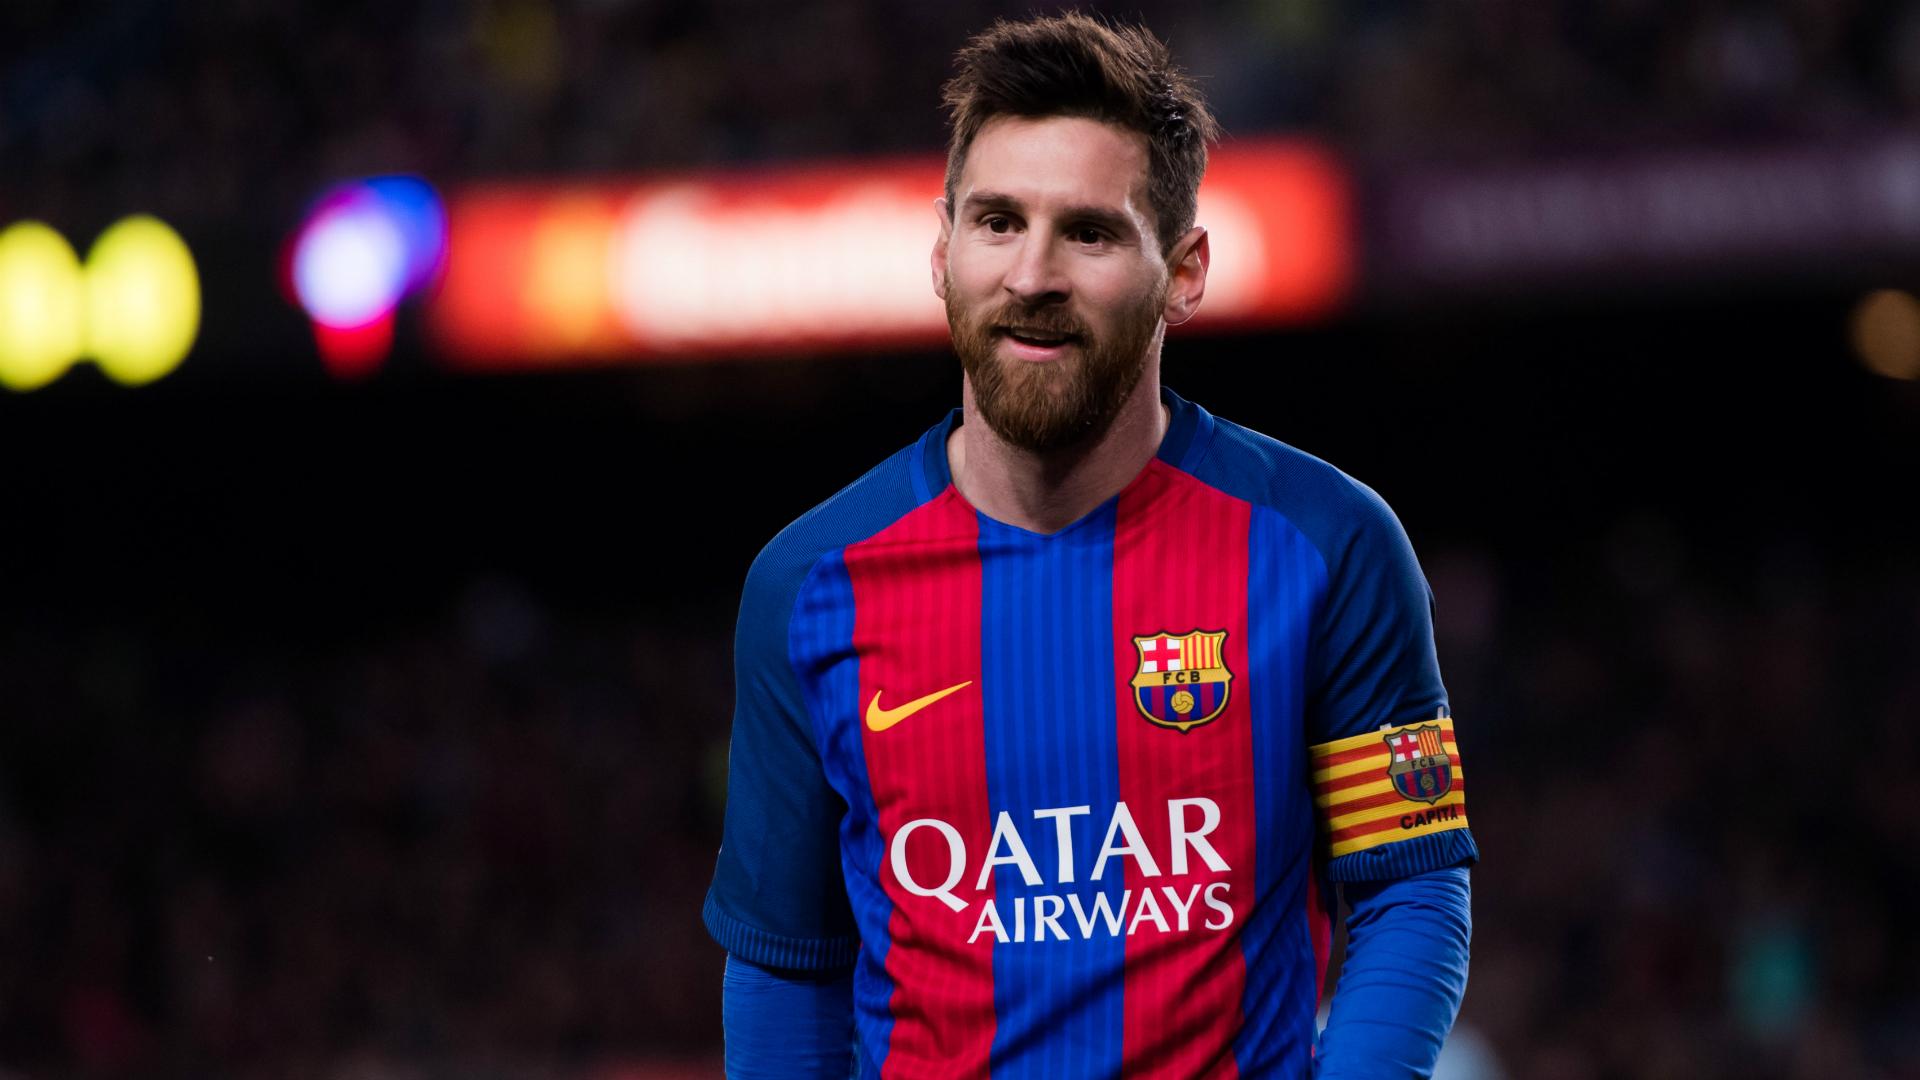 Wwe Girl Full Hd Wallpaper Leading Scorer Fc Barcelona Lionel Messi Pic